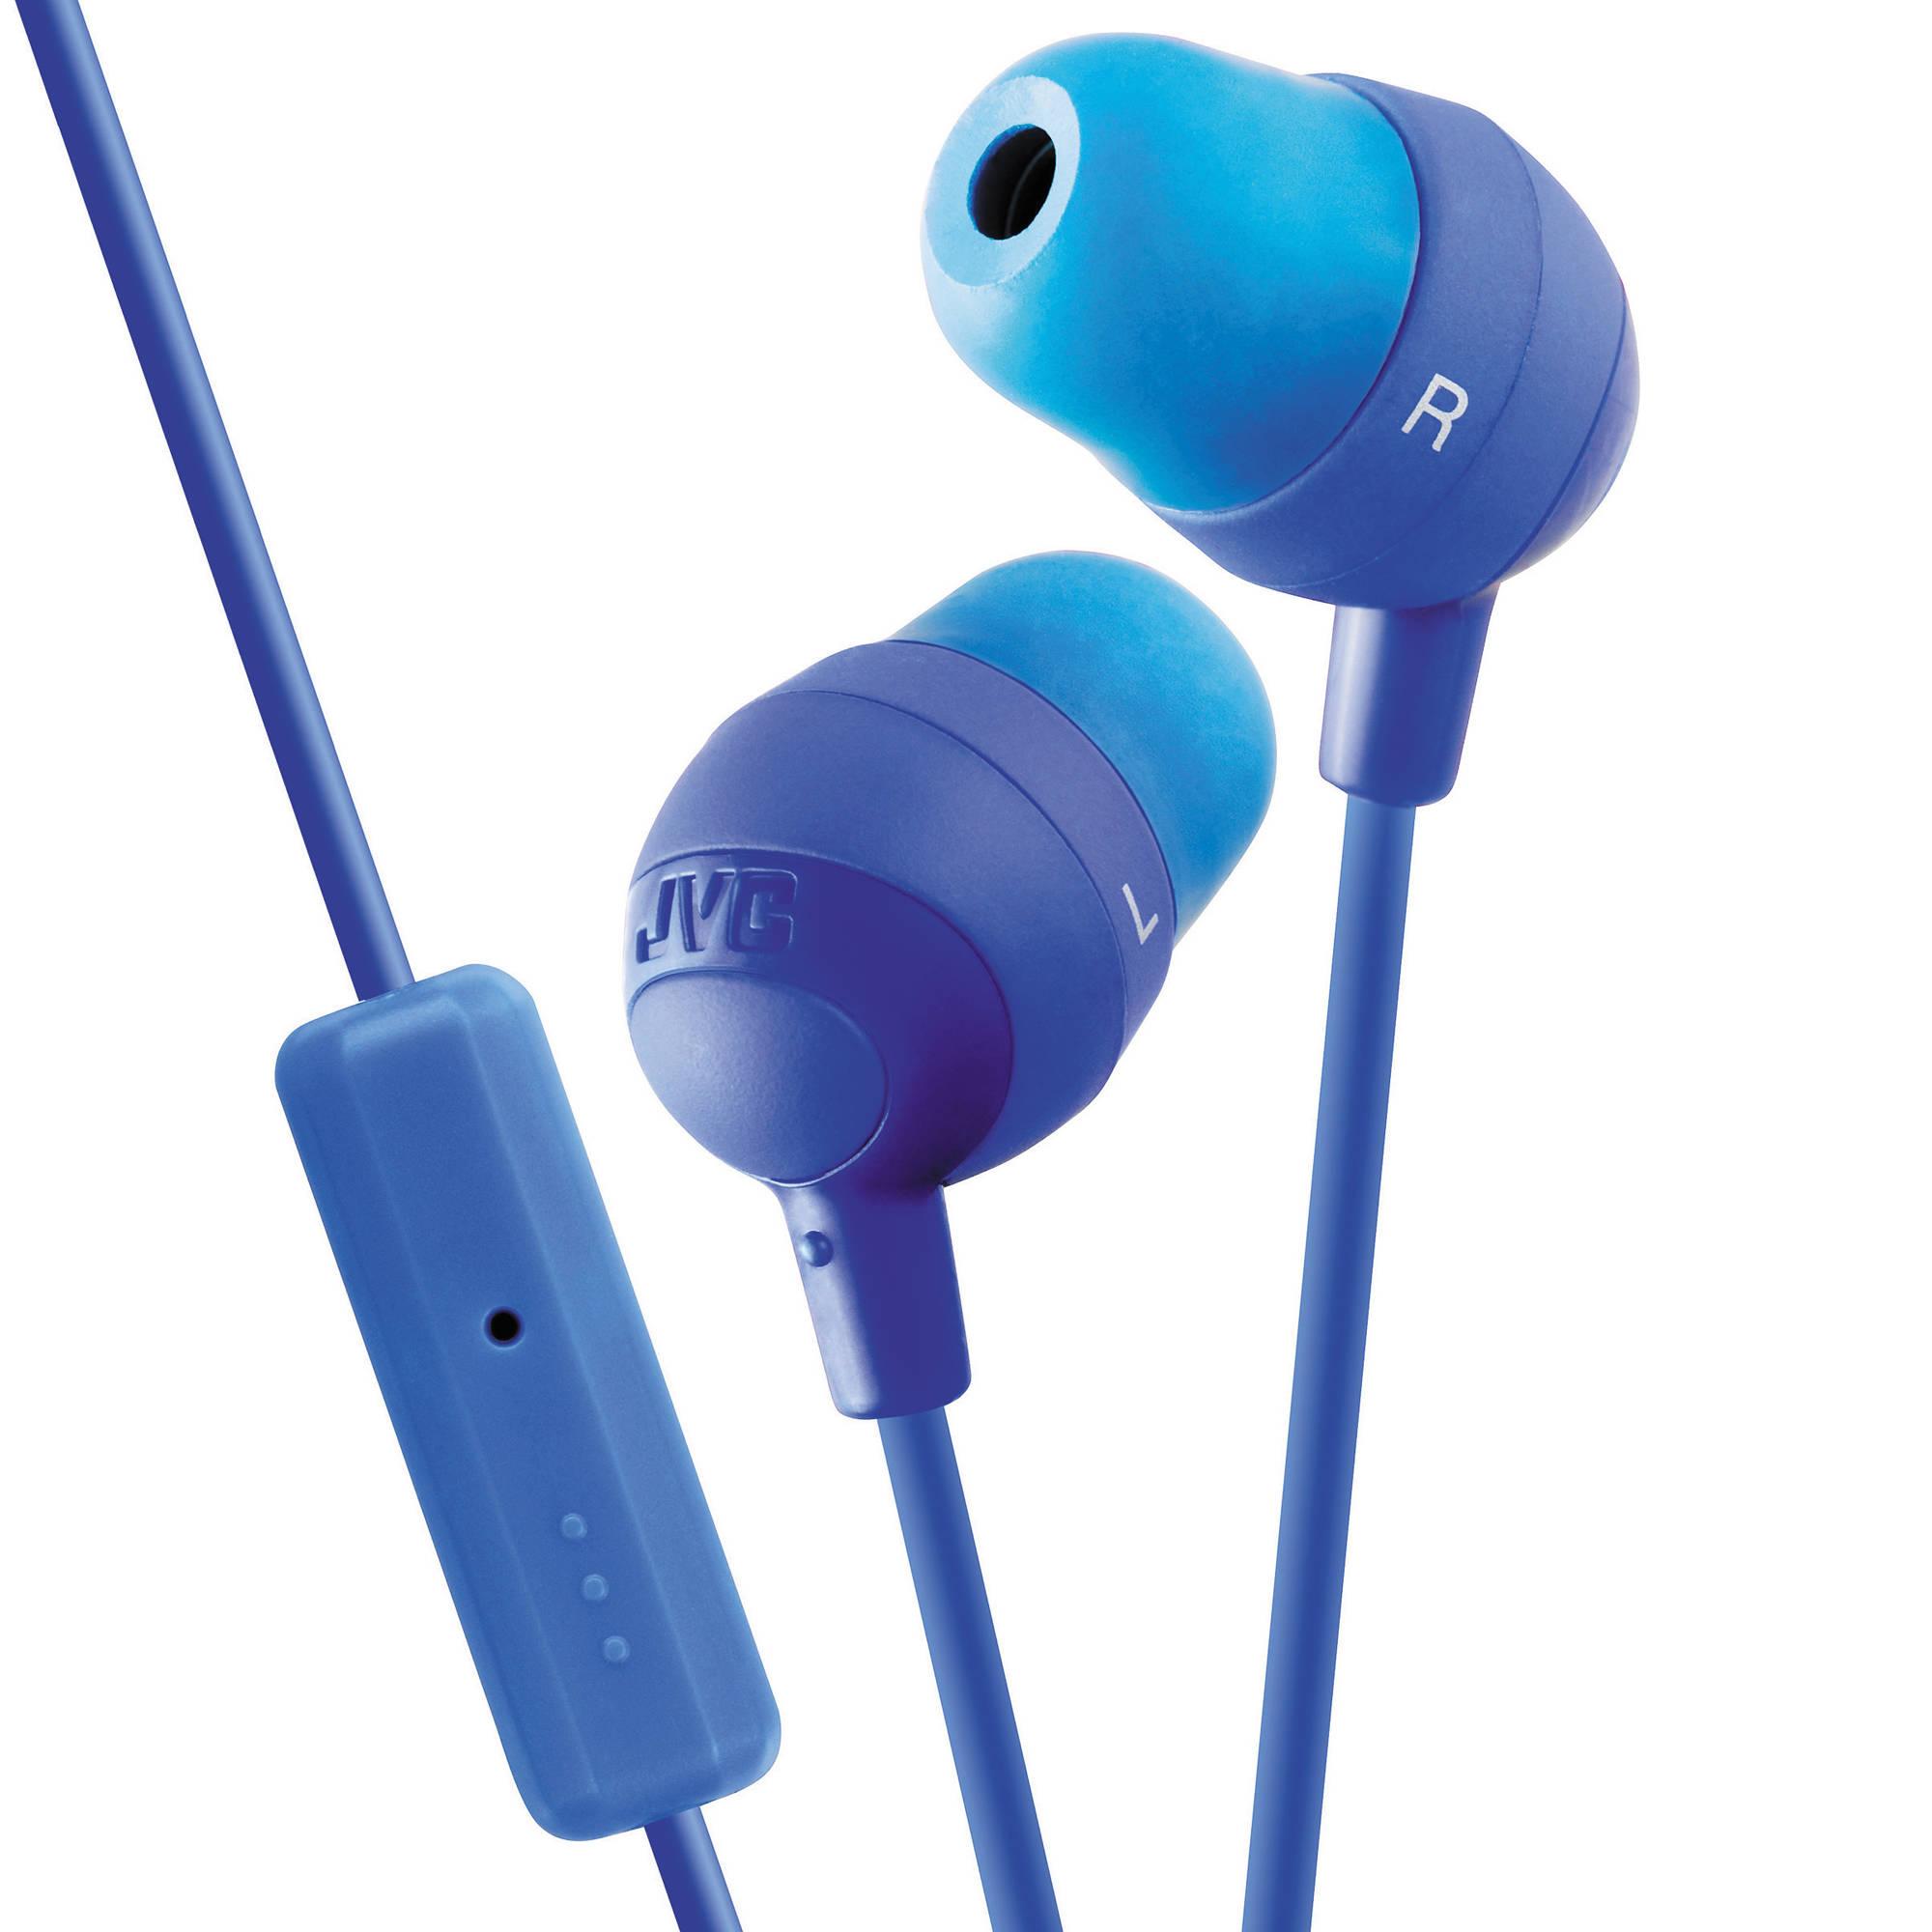 Jvc marshmallow earbuds mic - jvc gumy earbuds plus